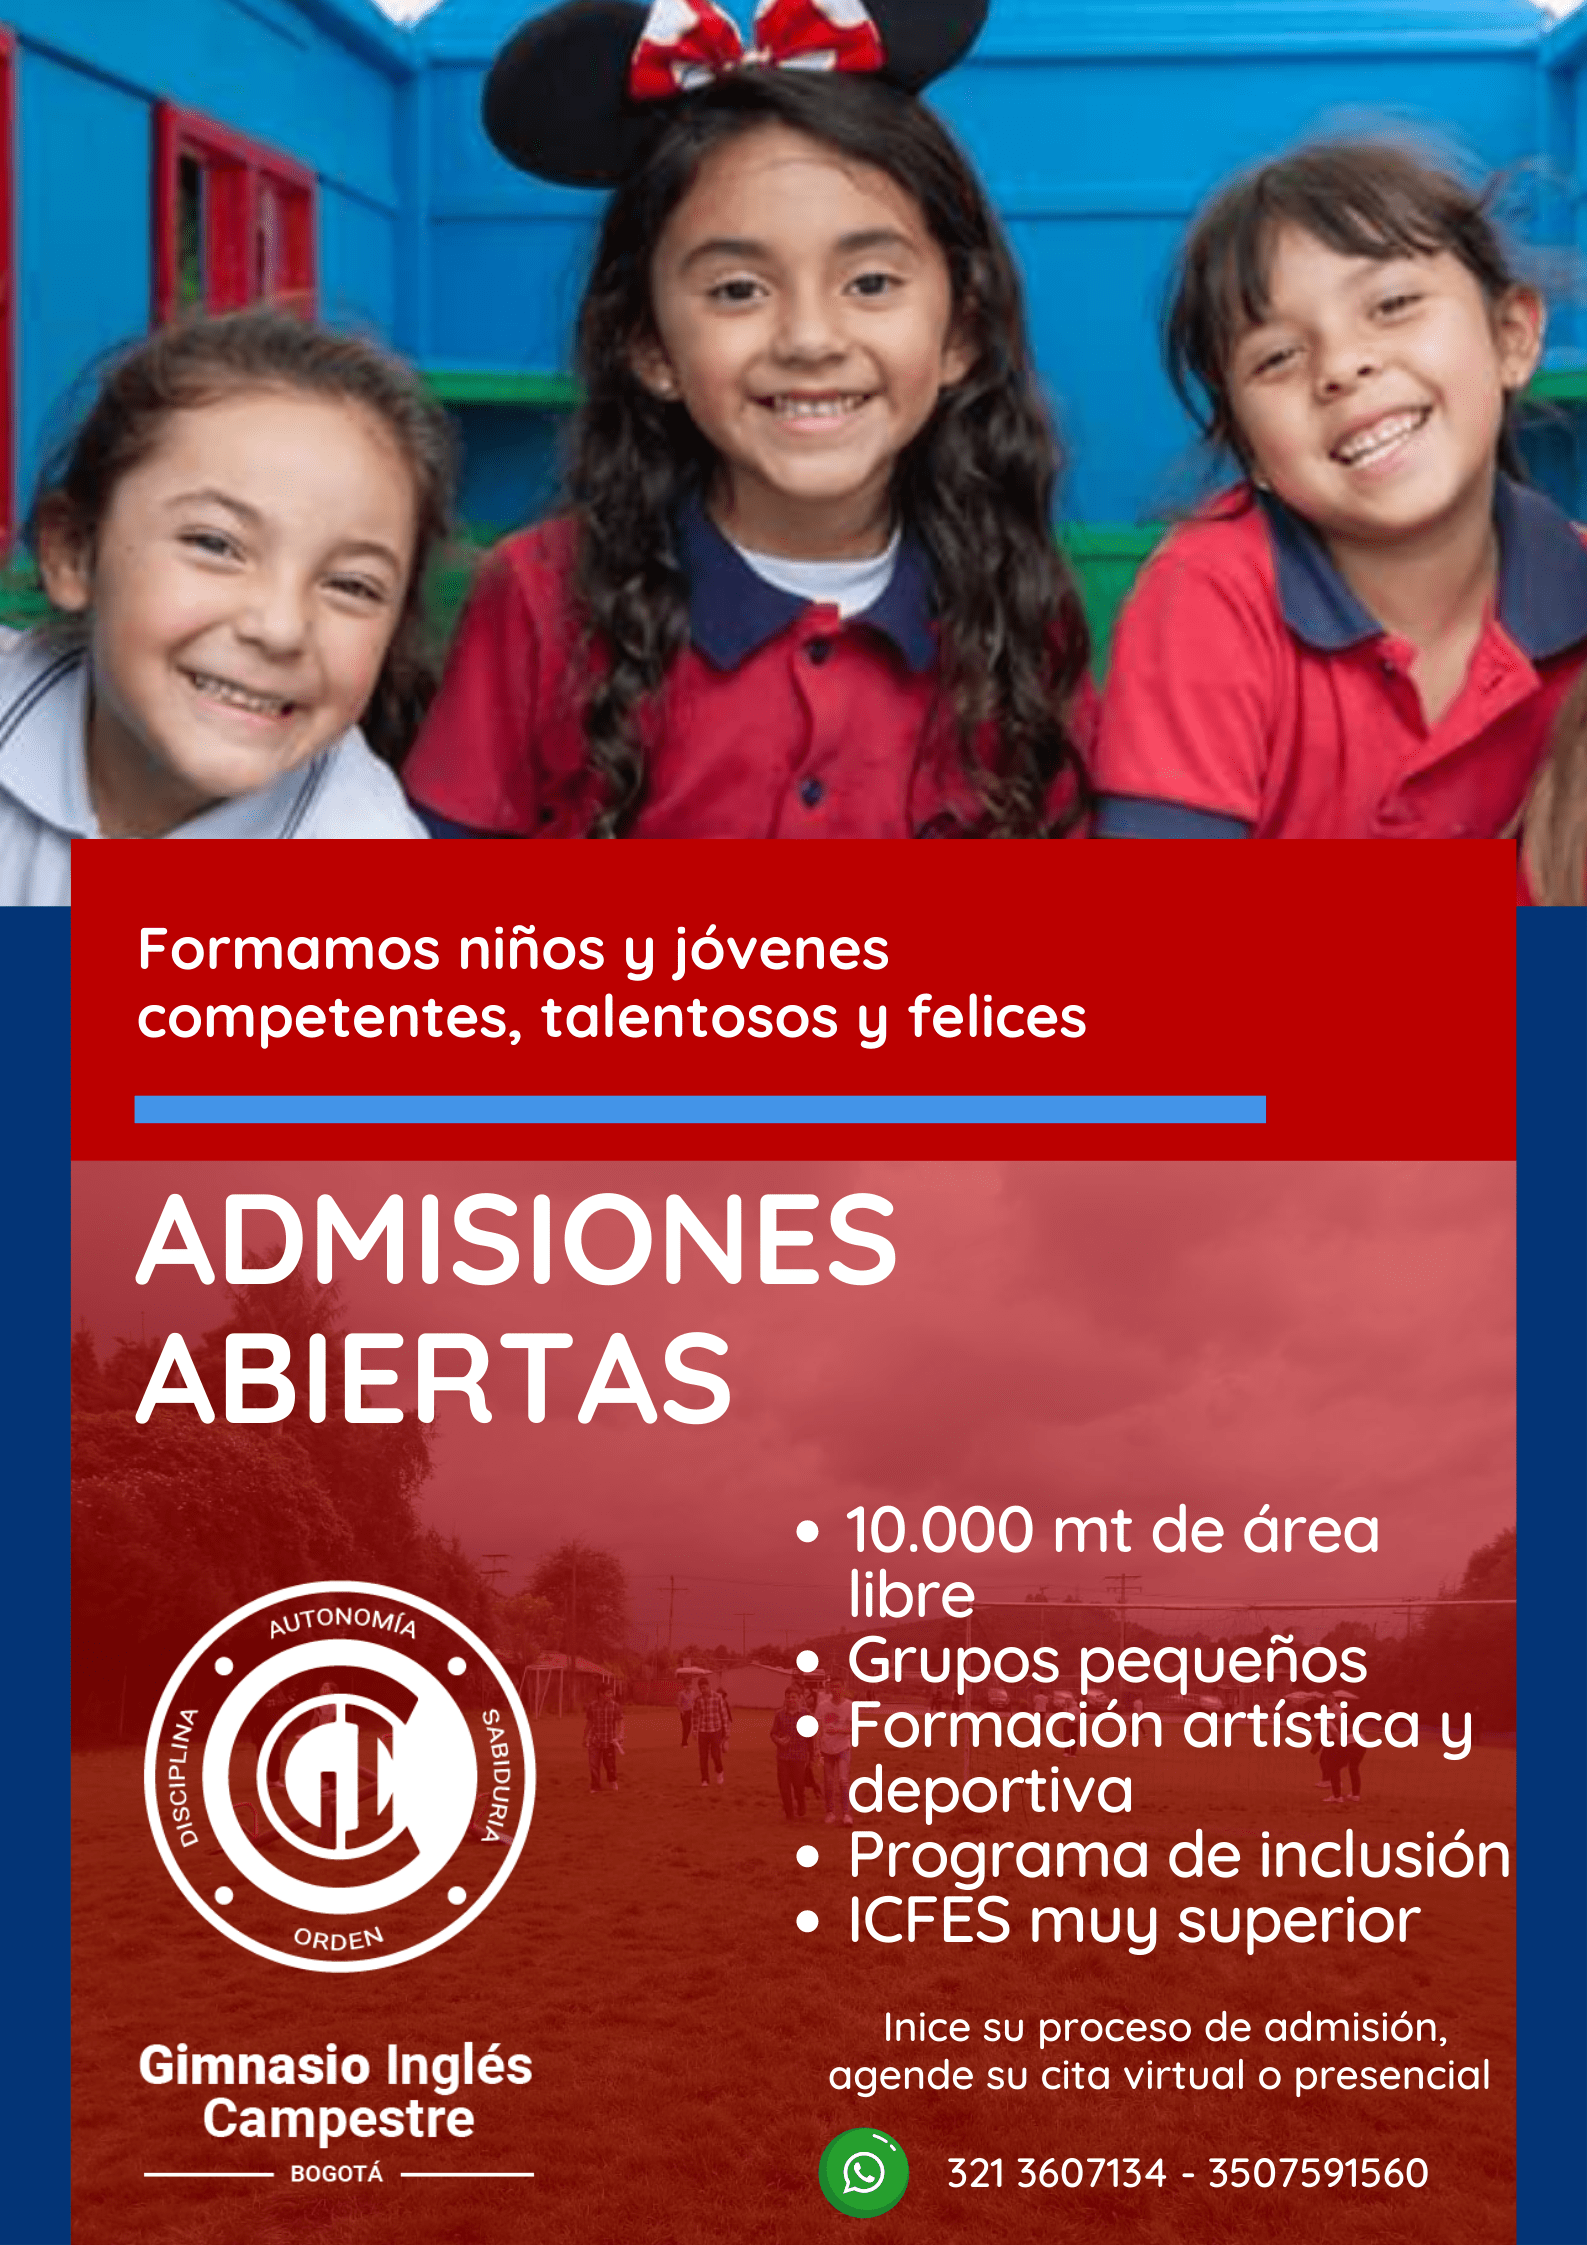 Gimnasio Inglés Campestre